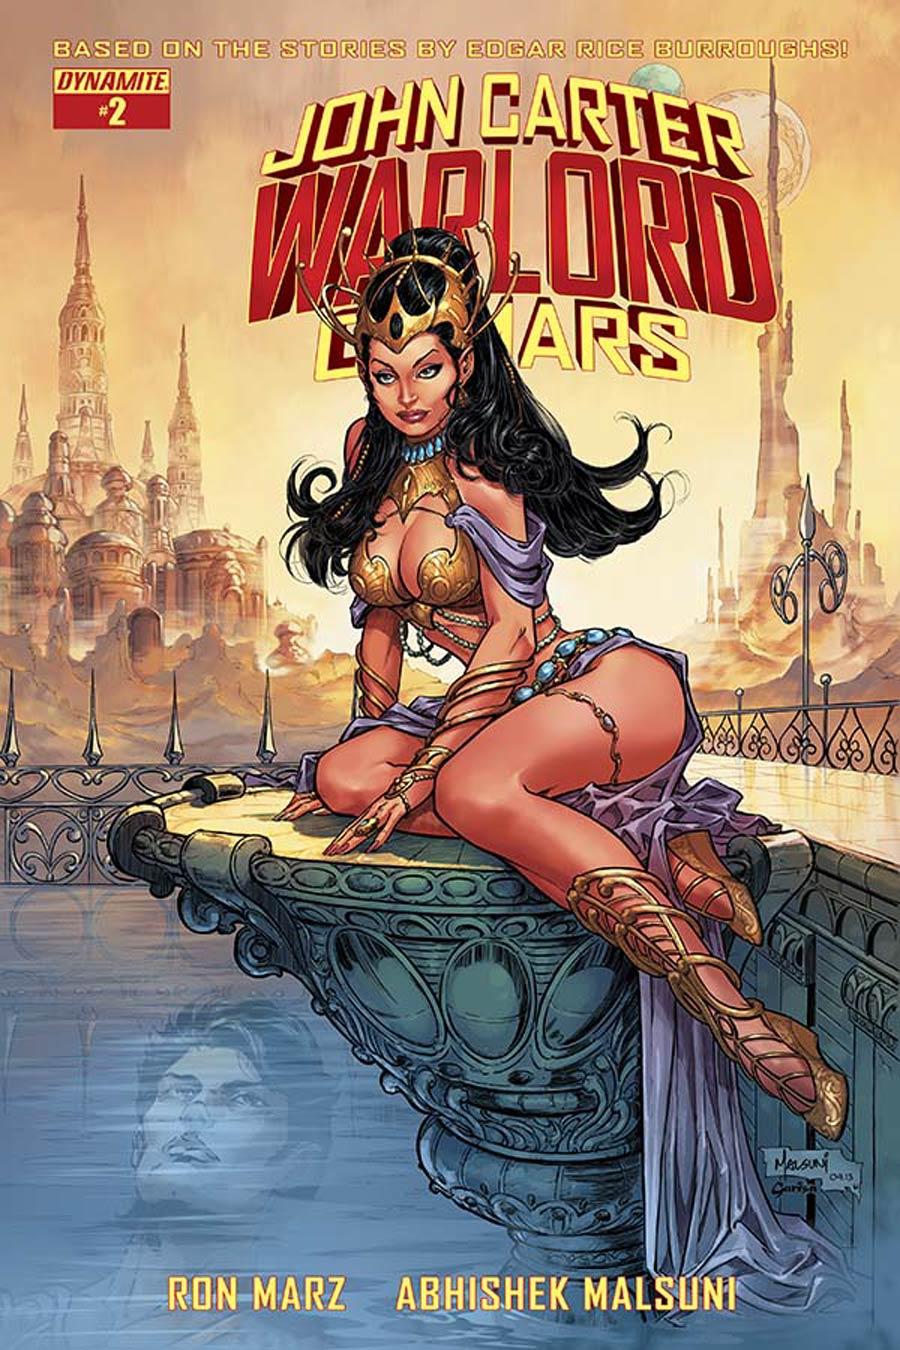 John Carter Warlord Of Mars Vol 2 #2 Cover D Variant Abhishek Malsuni Subscription Cover